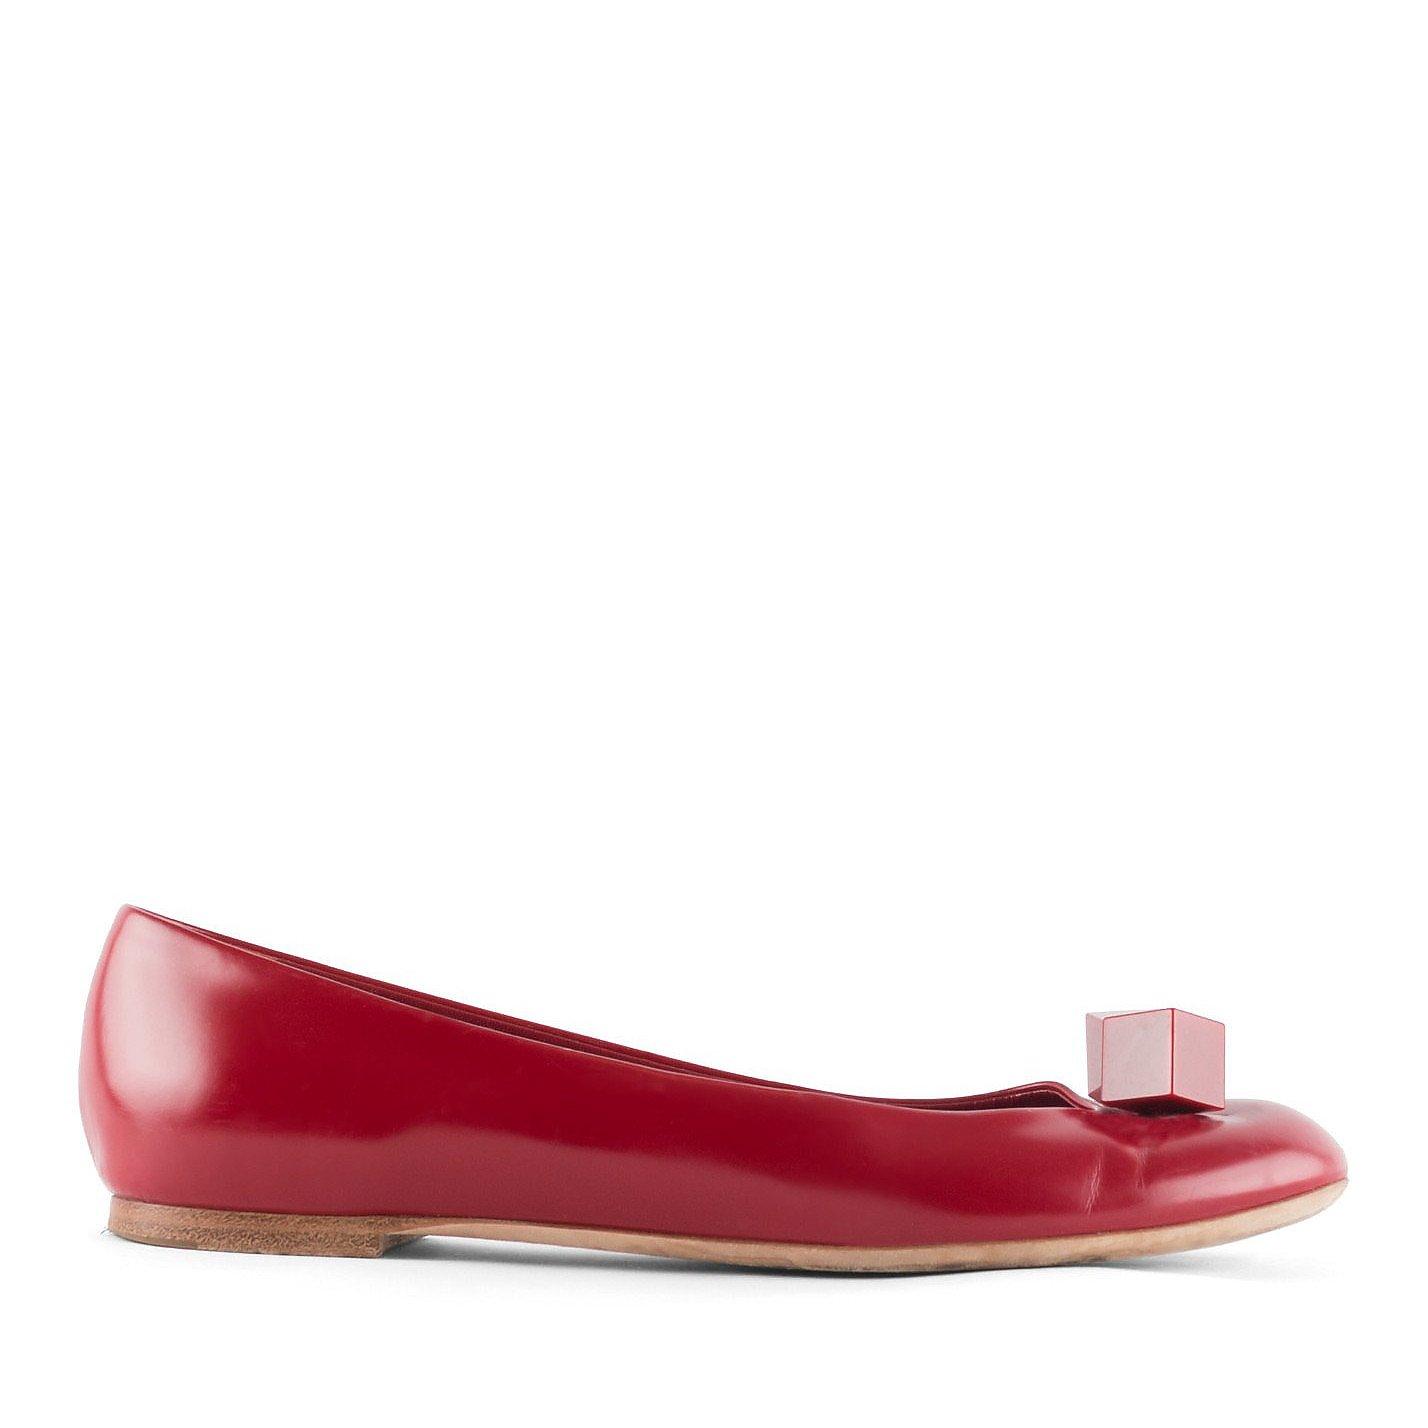 Louis Vuitton Dice Detail Ballet Flats